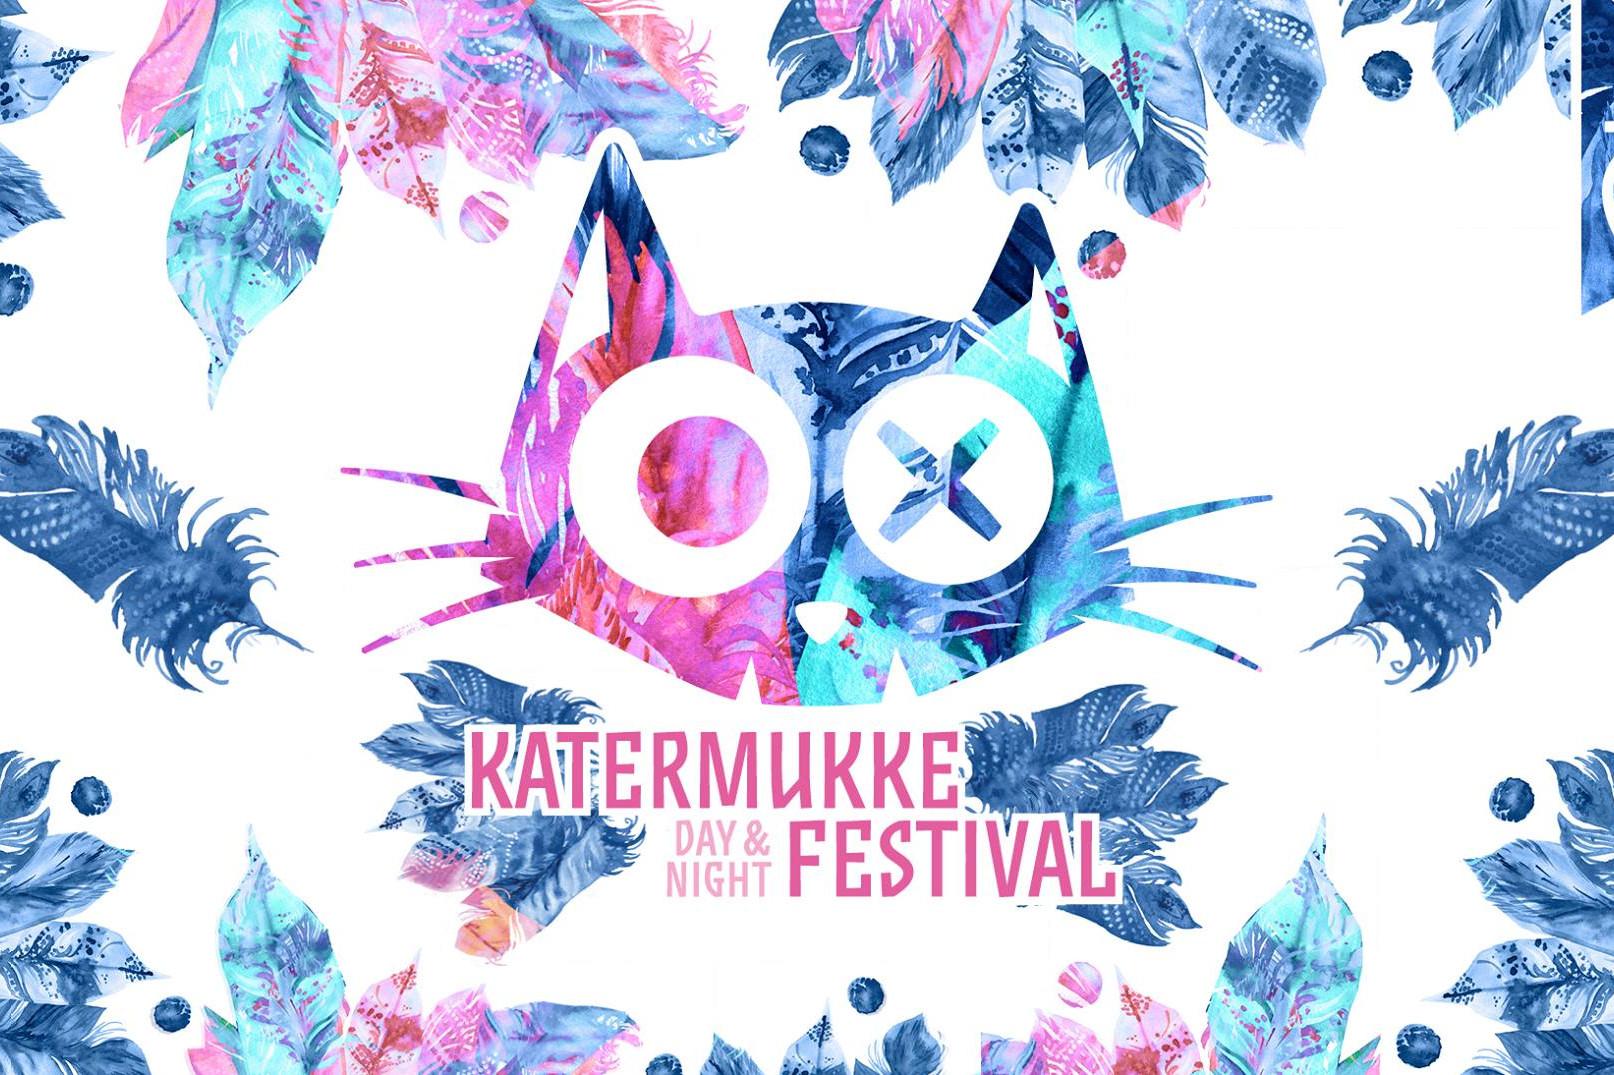 Katermukke Festival - Day & Night